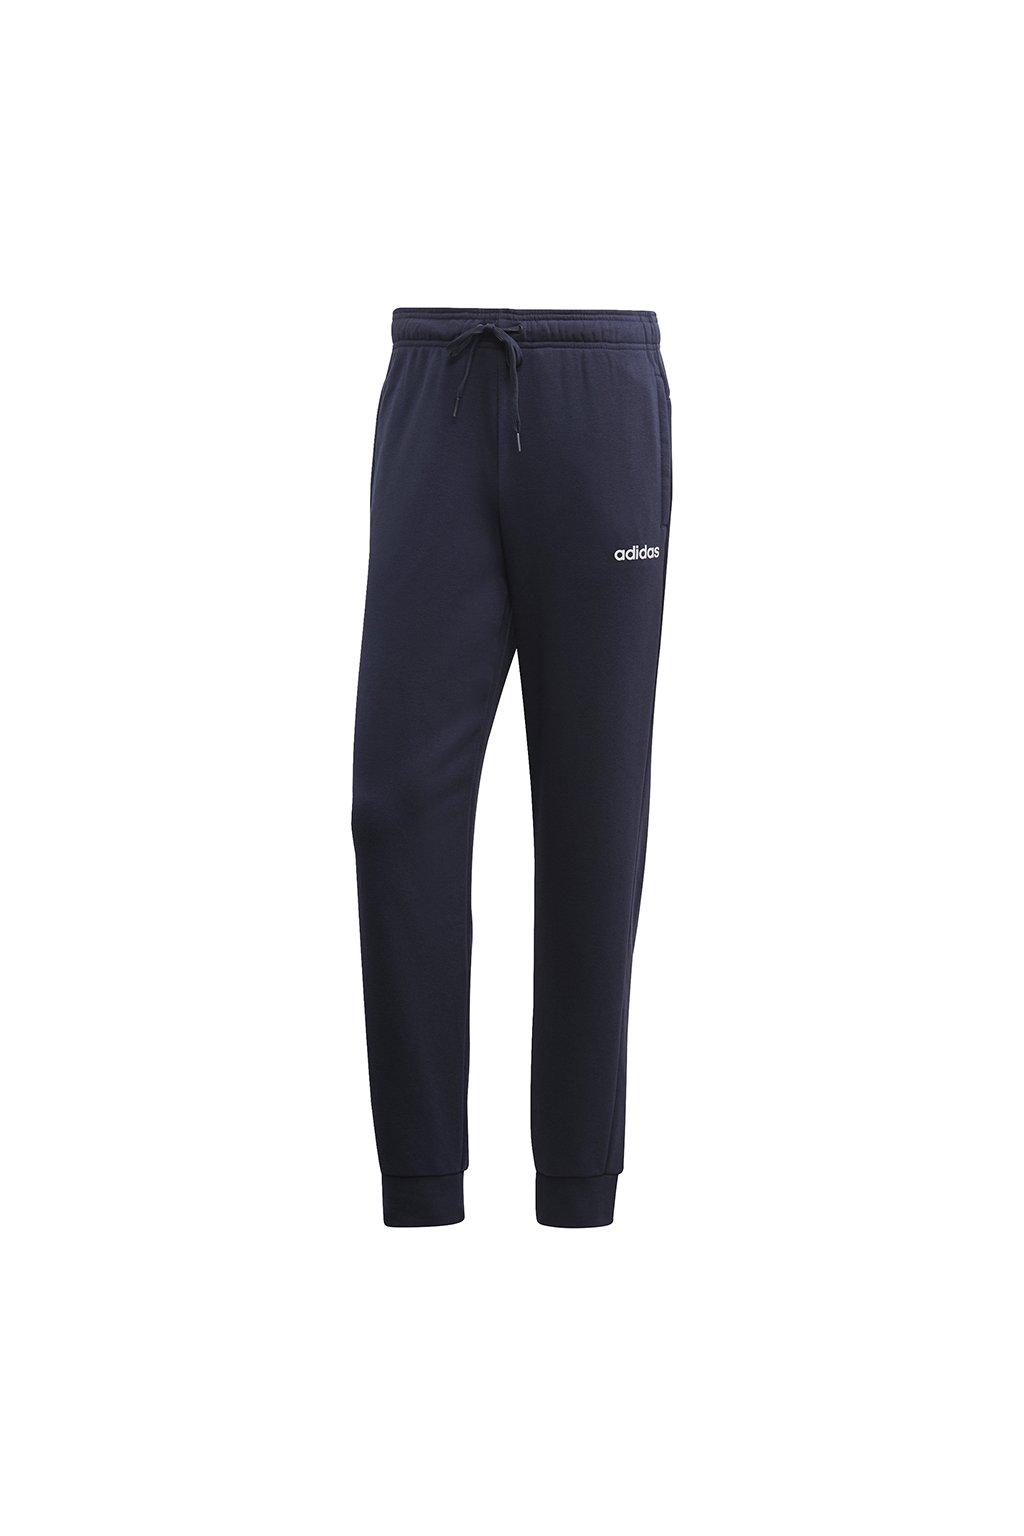 Pánske tepláky Adidas Essentials Plain Slim Pant FT tmavo modré DU0370